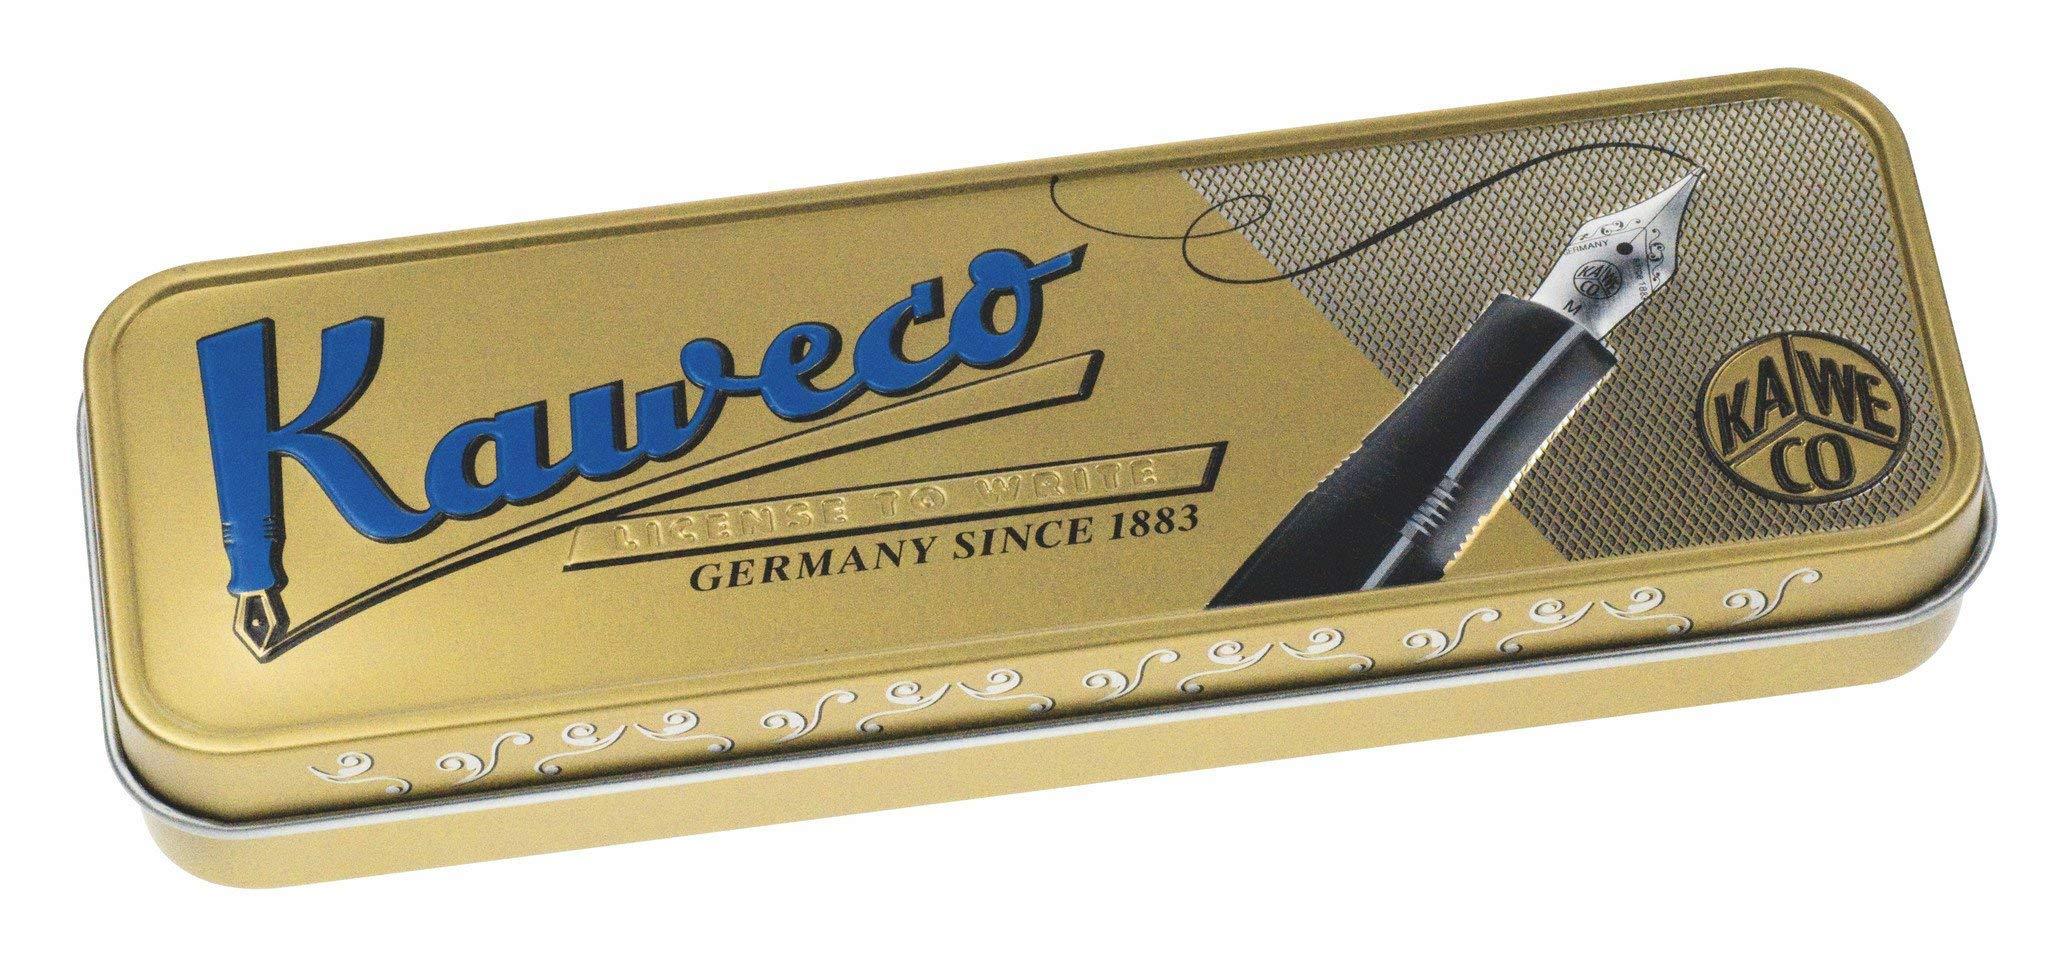 Kaweco AL Sport Fountain Pen (Fine Nib) + Pack of 6 Black Ink Cartridges Gift Set (Brass) by Kaweco